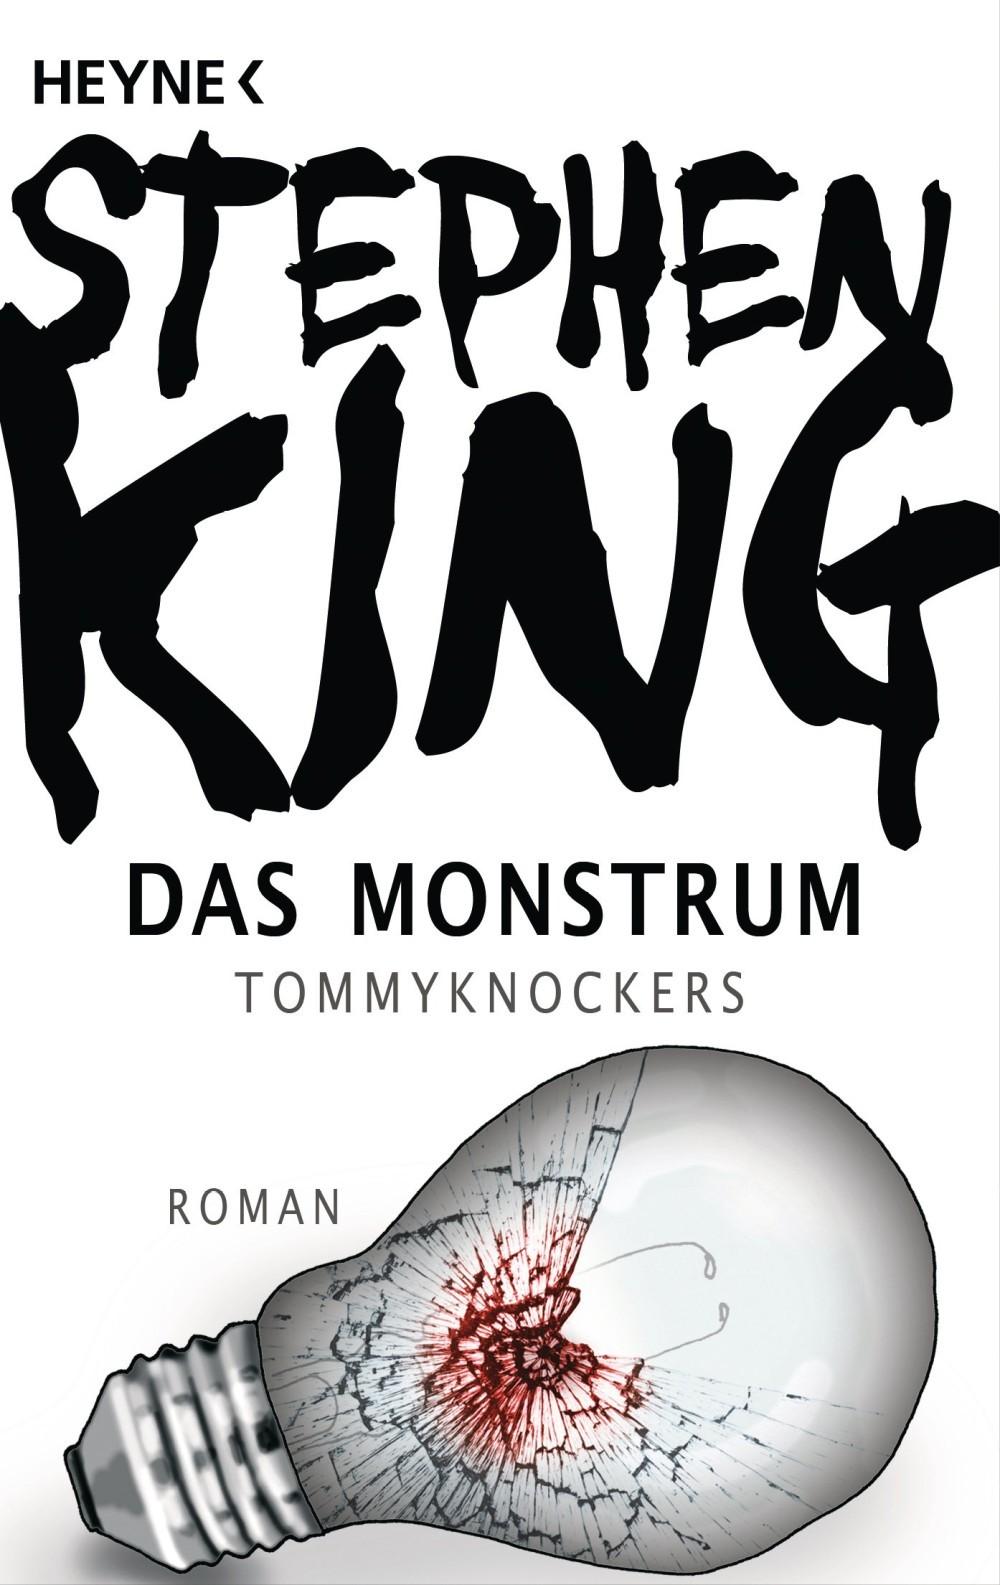 Das Monstrum - Tommyknockers